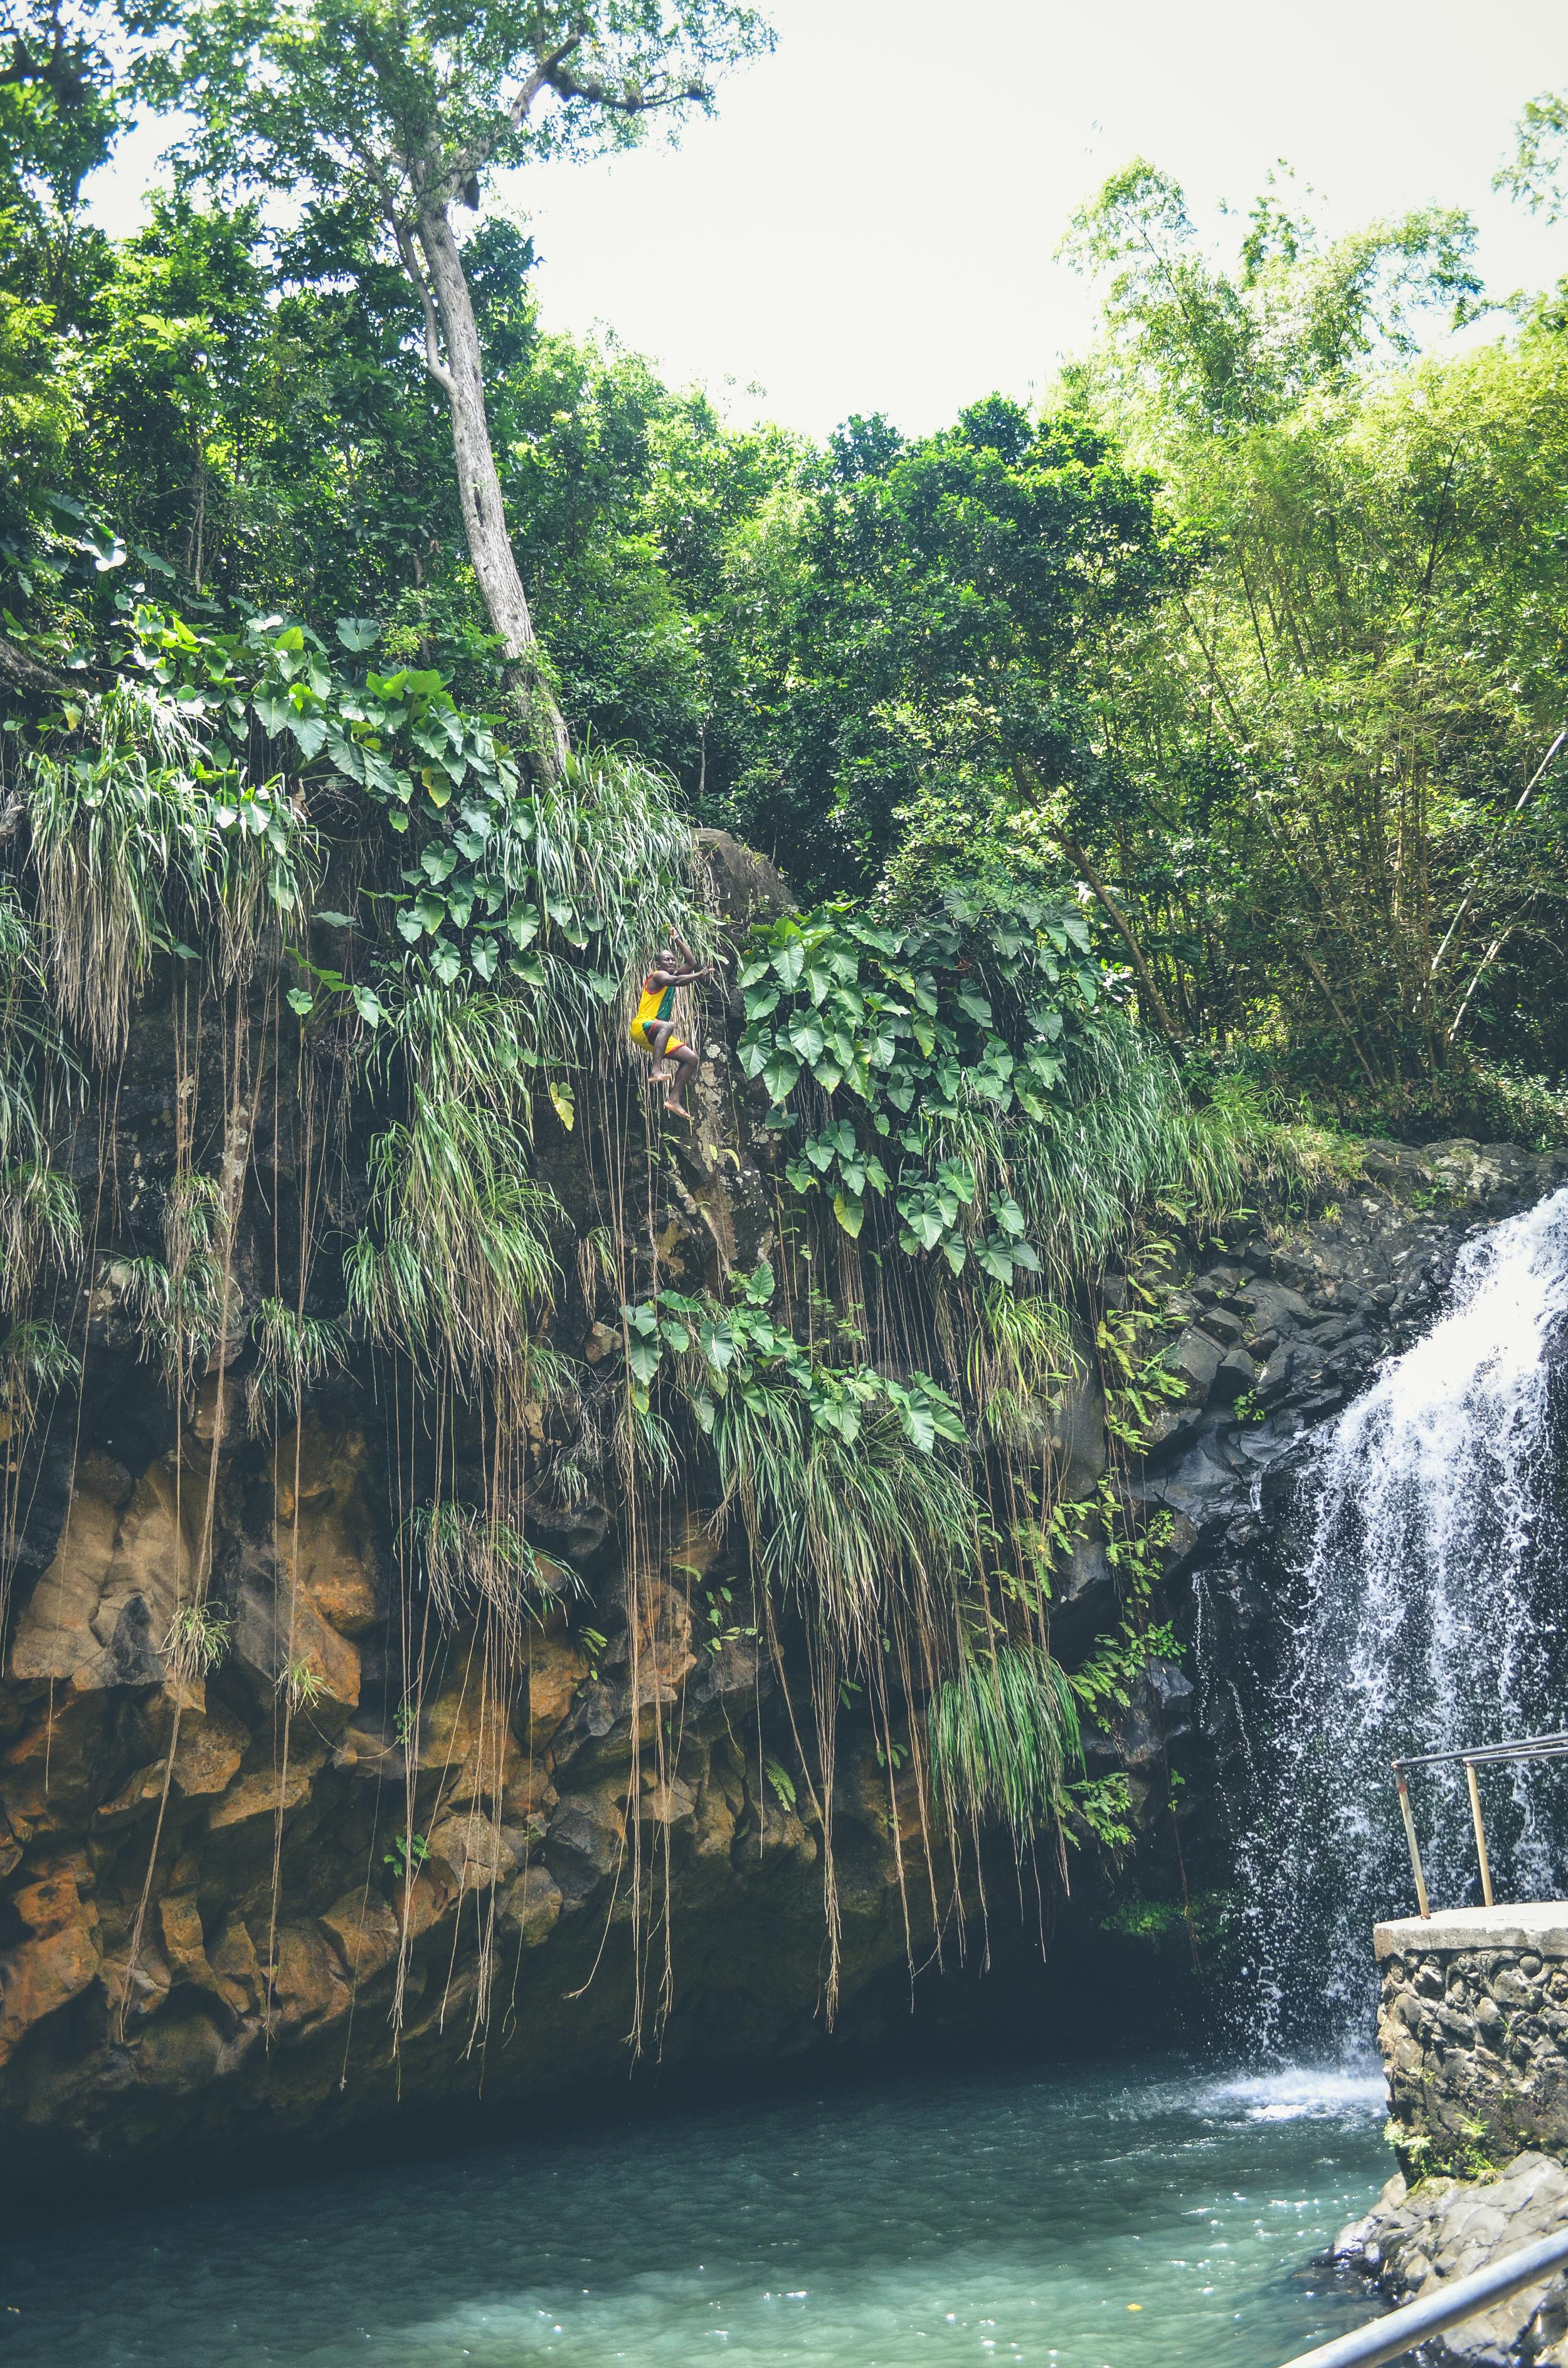 Jumping Annandale Falls, Grenada.